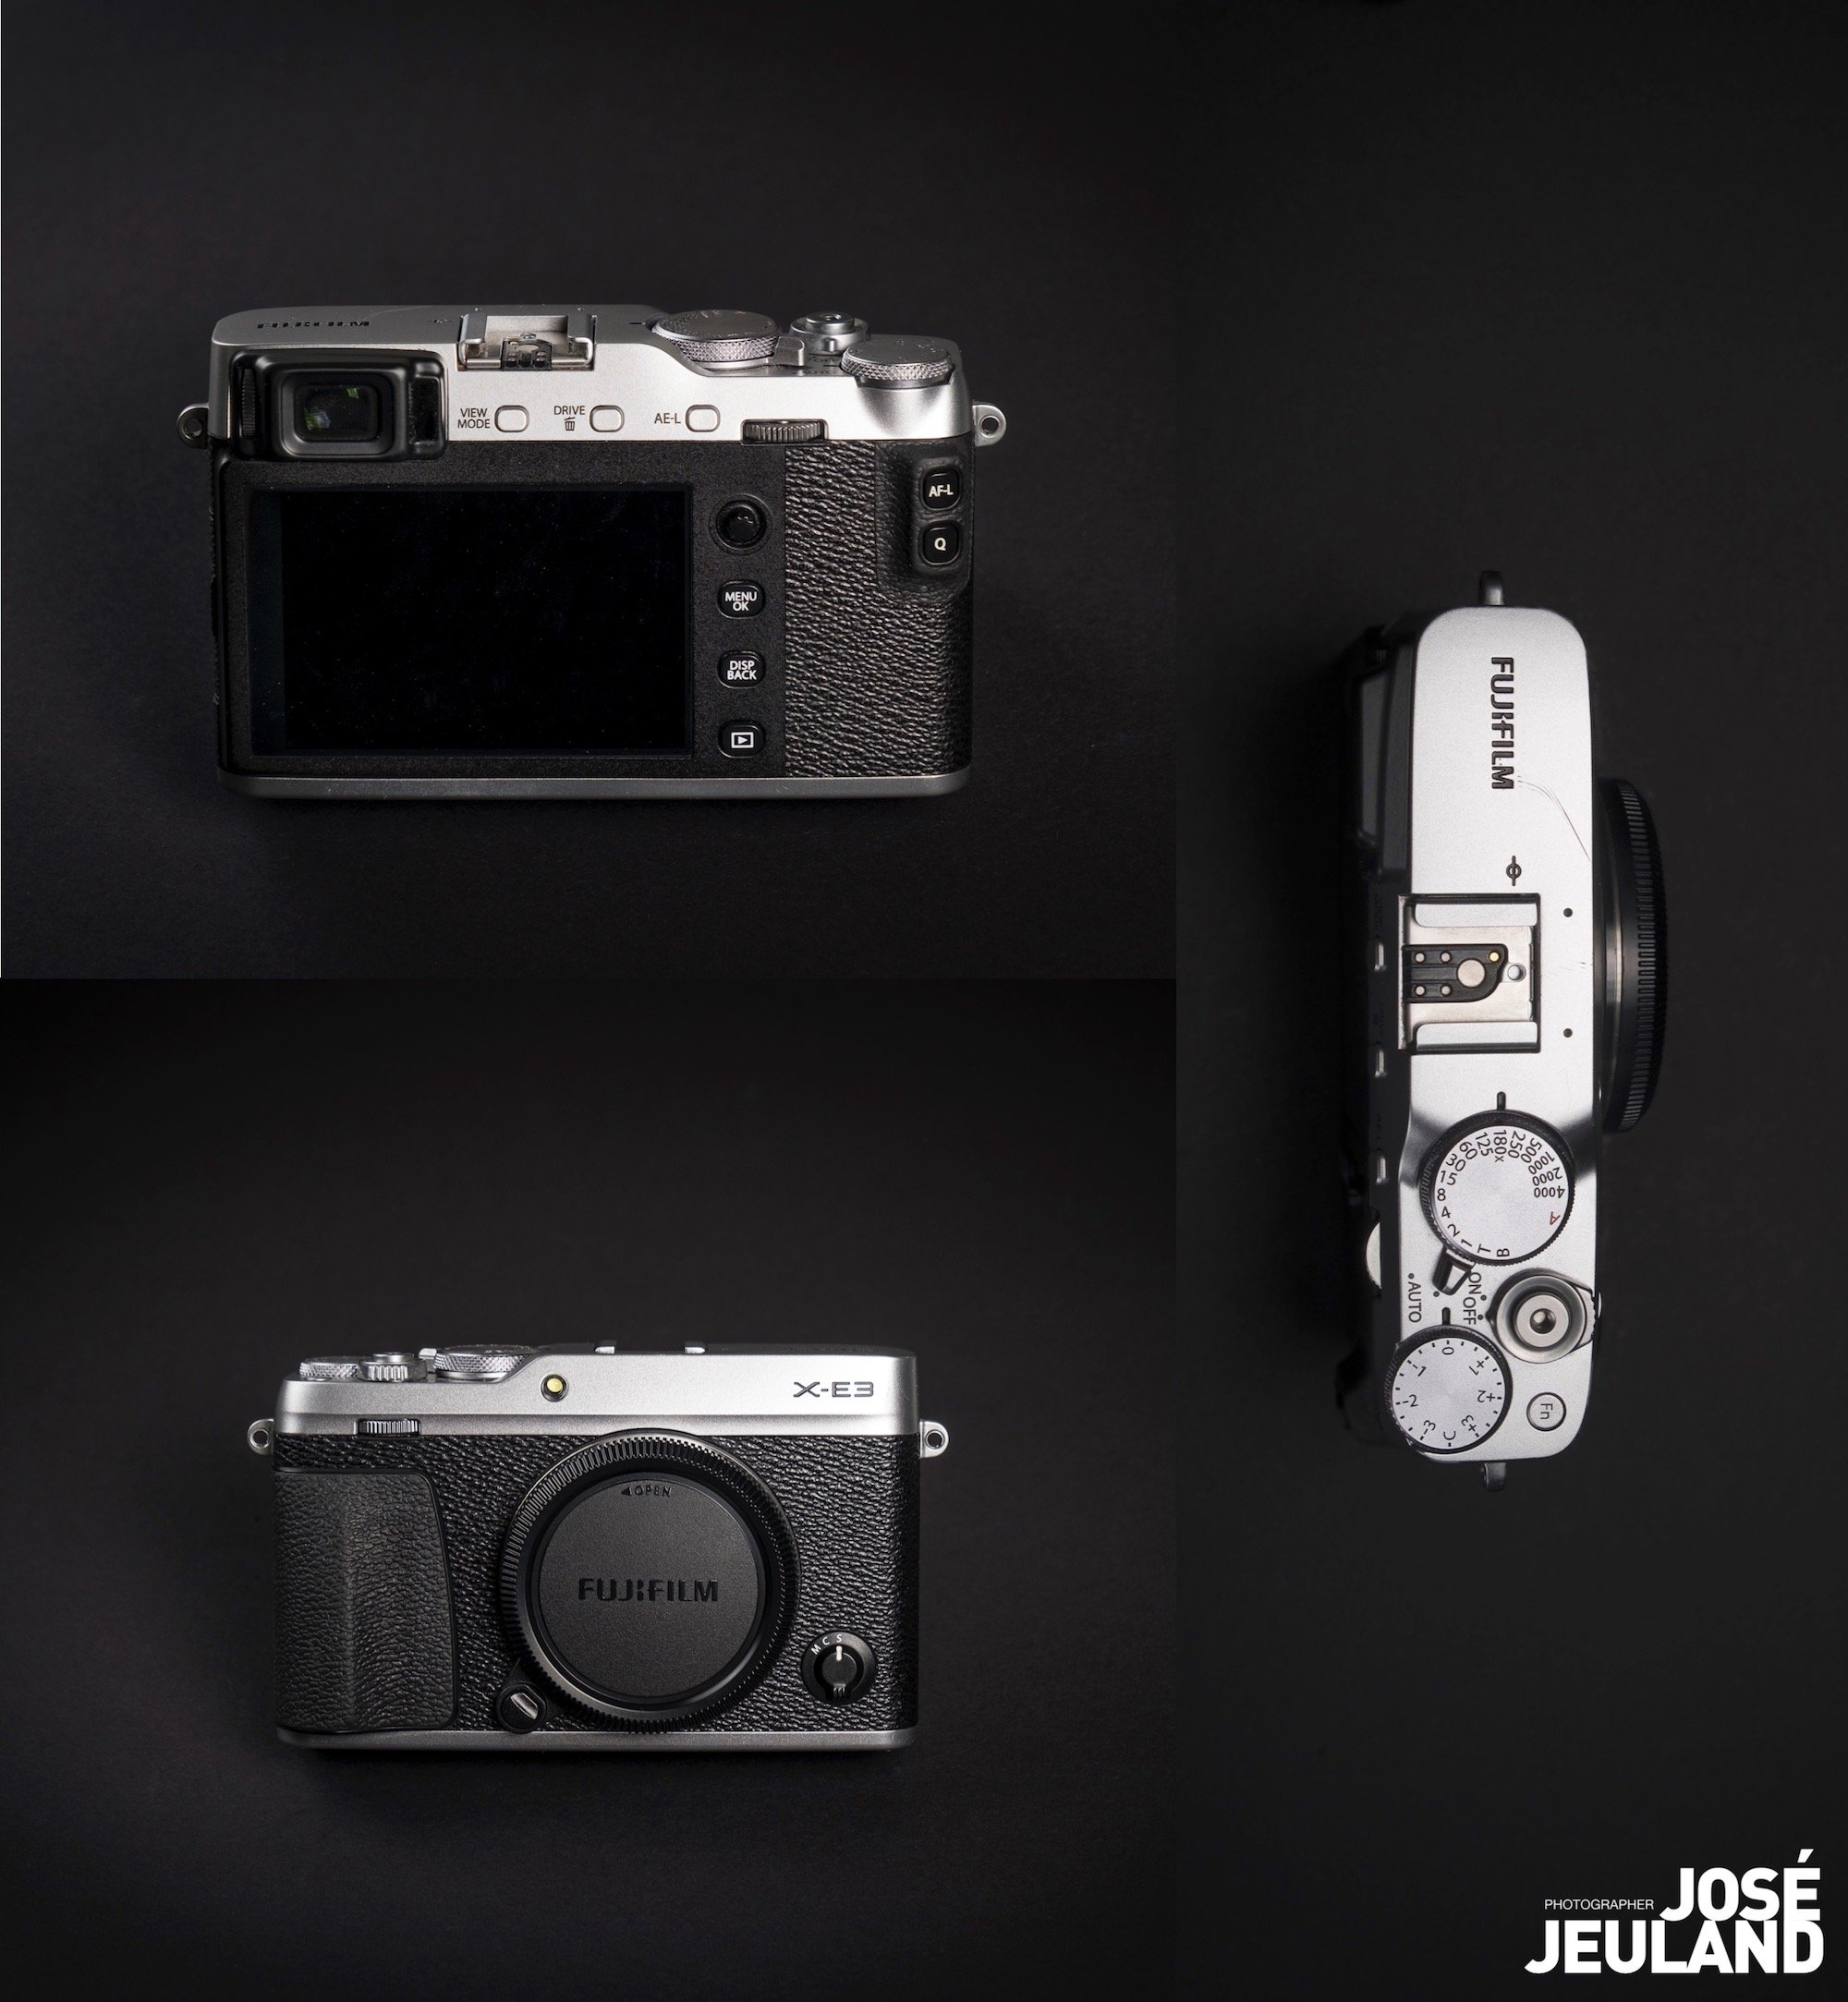 FUJIFILM X-E3 - Ultra Compact & Outstanding Image Quality - Jose Jeuland